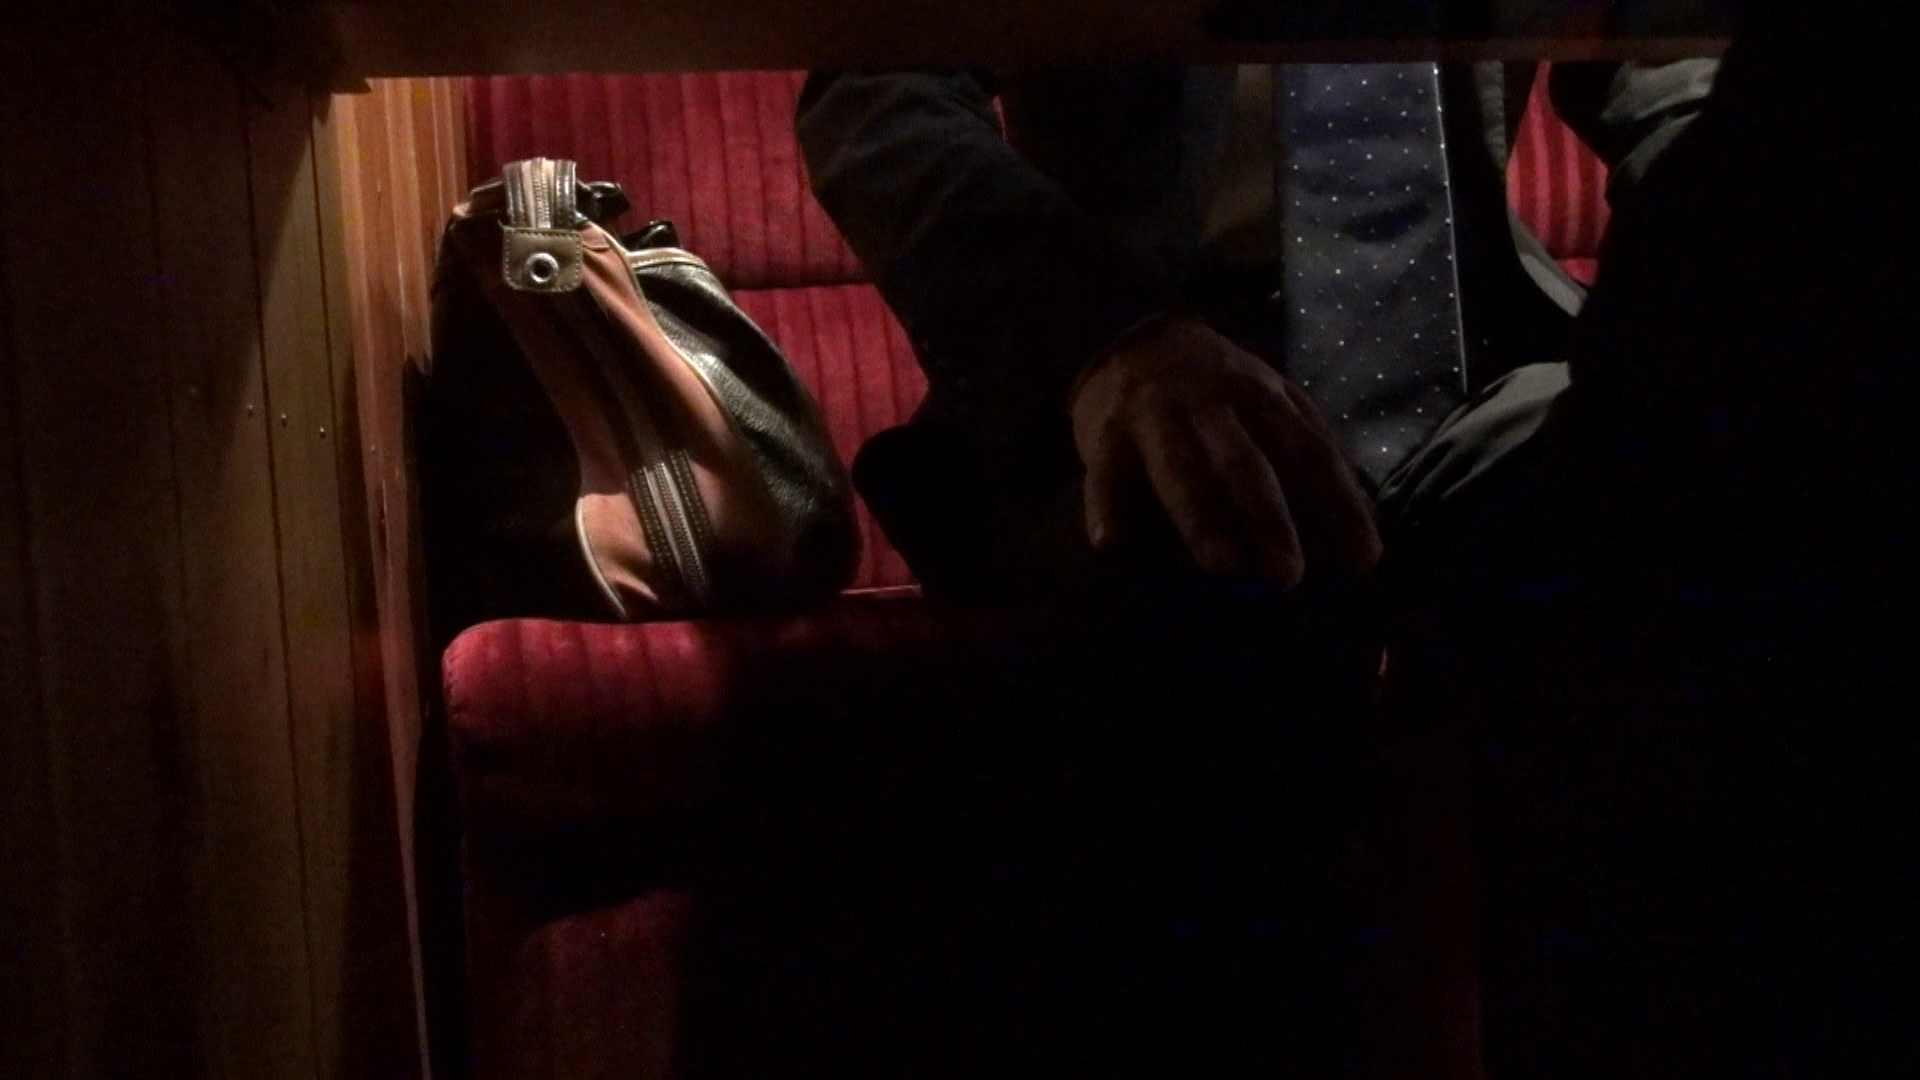 episode1 ヒロトさんと保険外交員との顔合わせ 盗撮 エロ無料画像 71pic 17